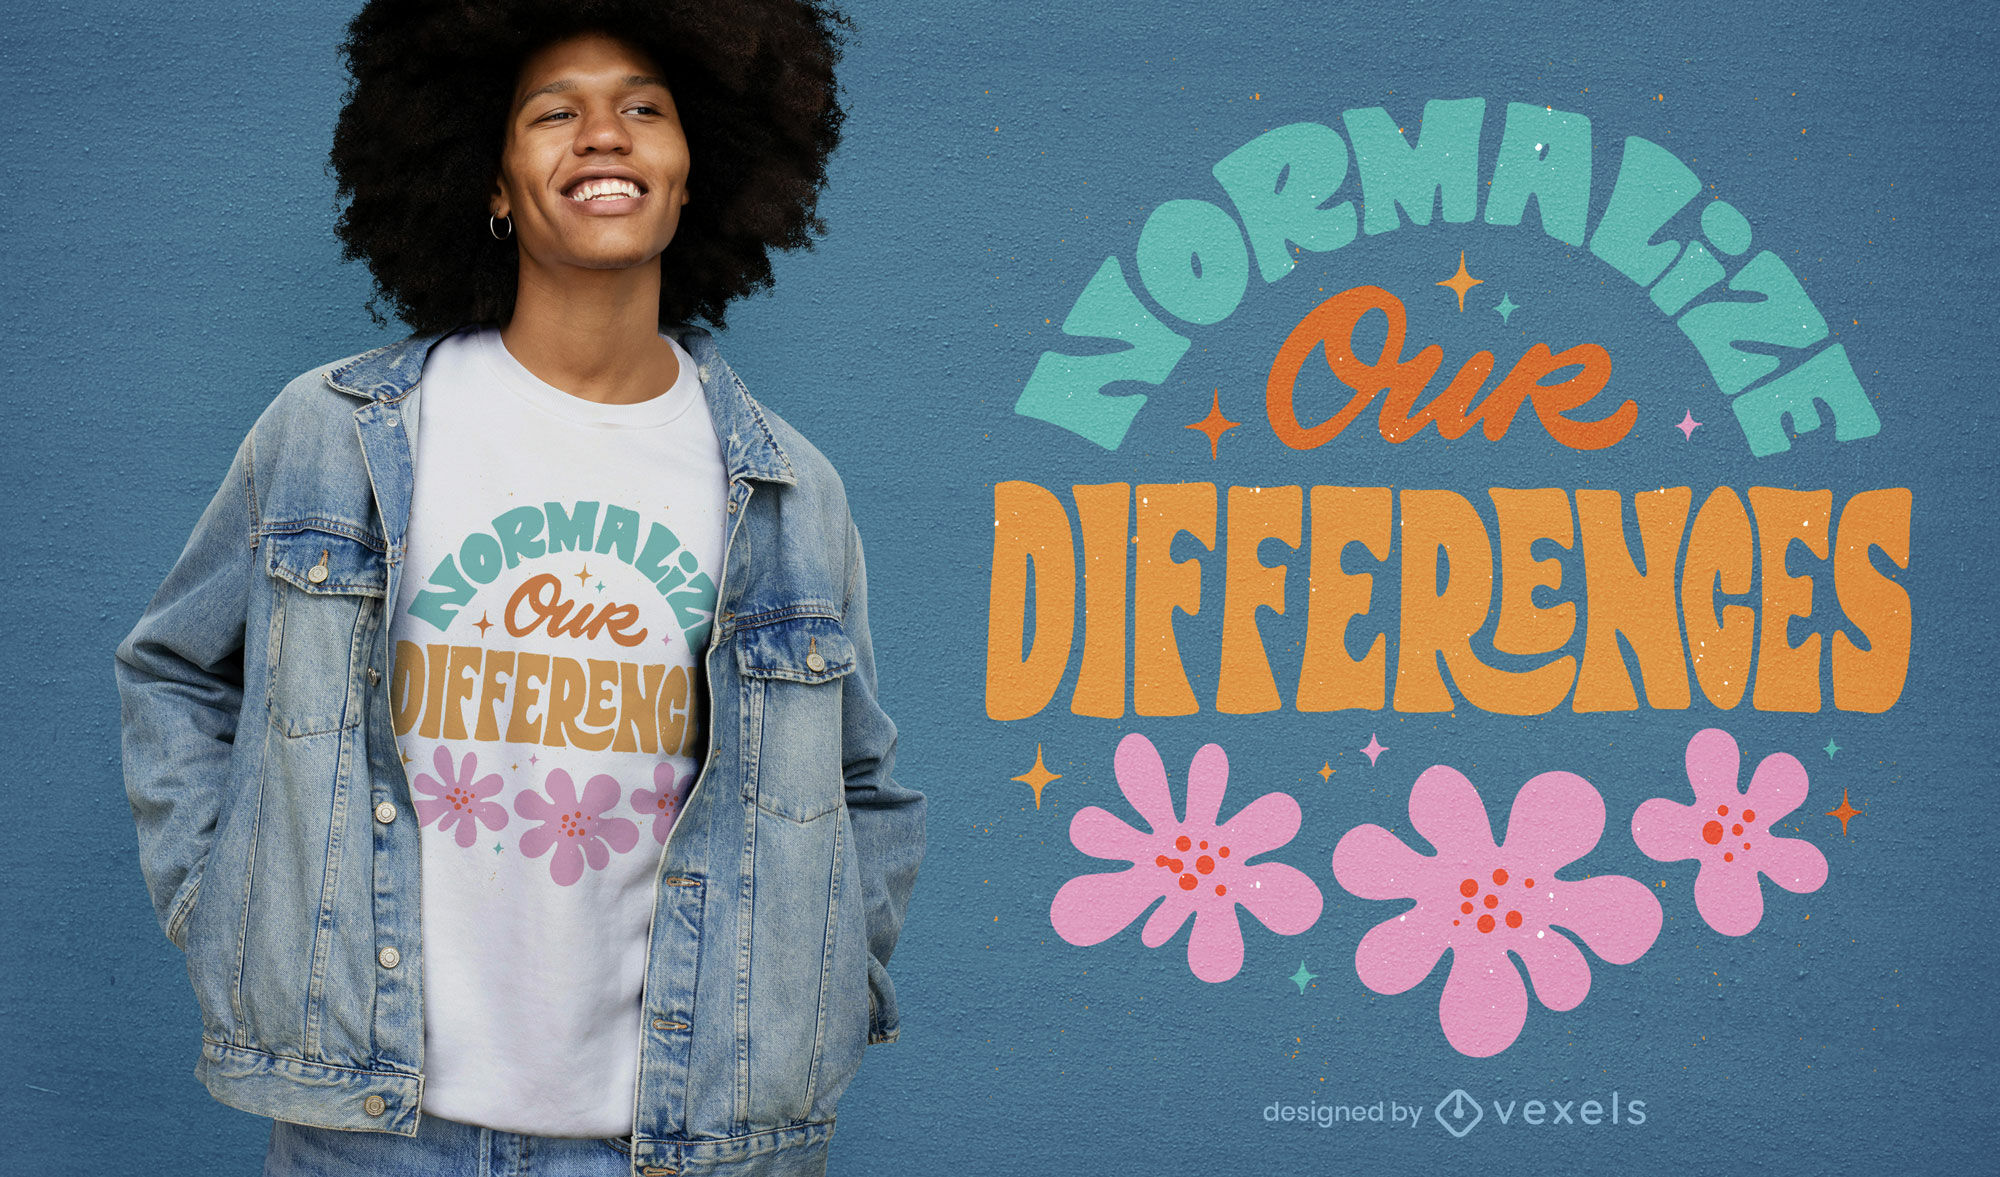 Dise?o de camiseta con cita floral de neuro diversidad.